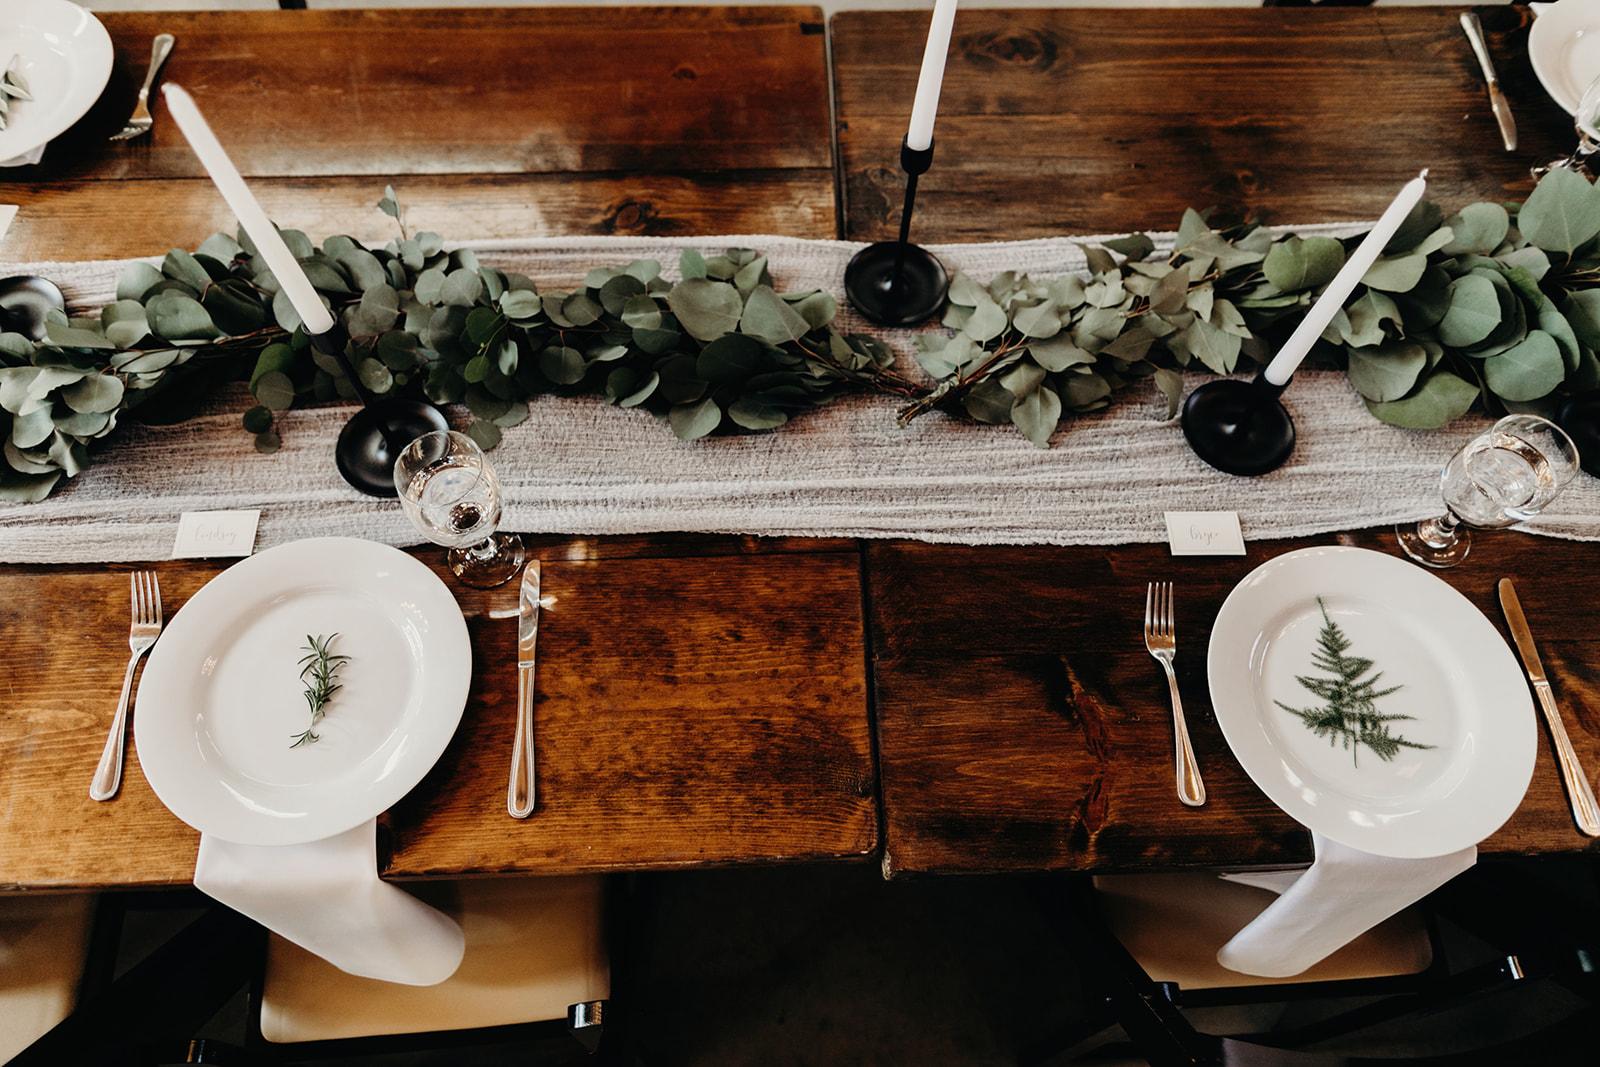 austin-wedding-lindsey-bryce-587.jpg